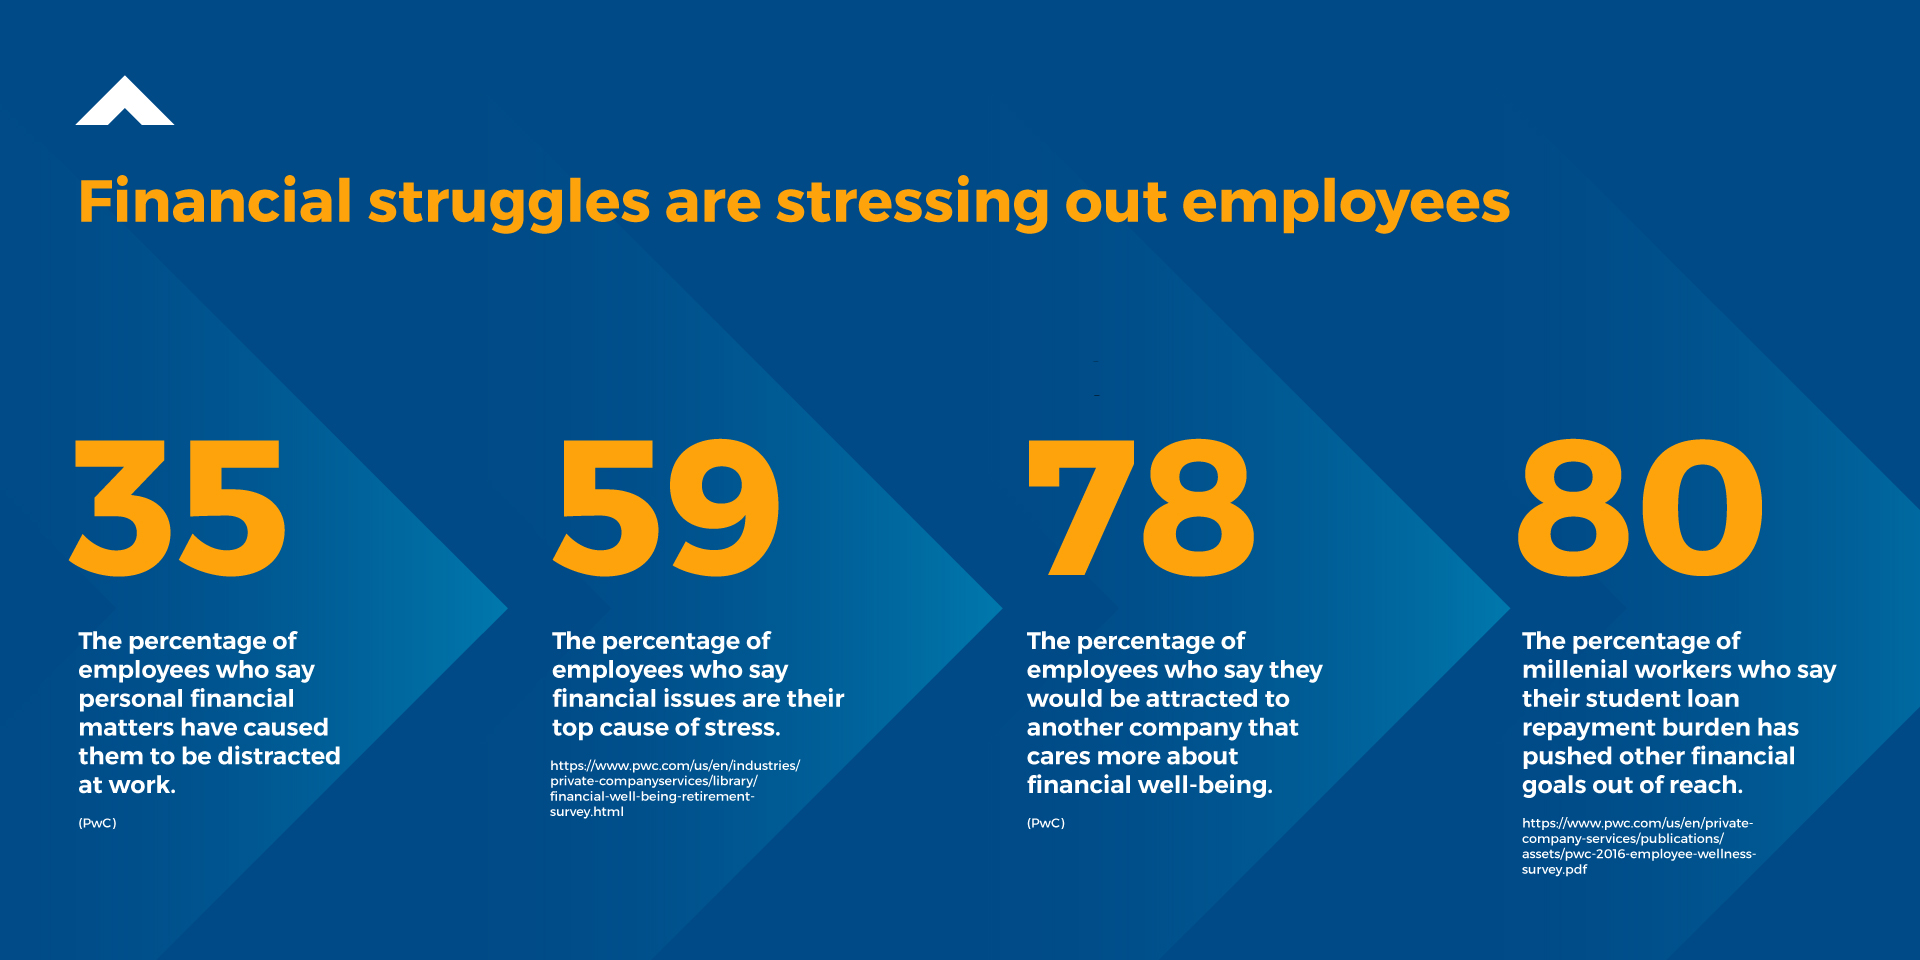 2019_stress-and-finances-infographic_part2_v1.2.jpg